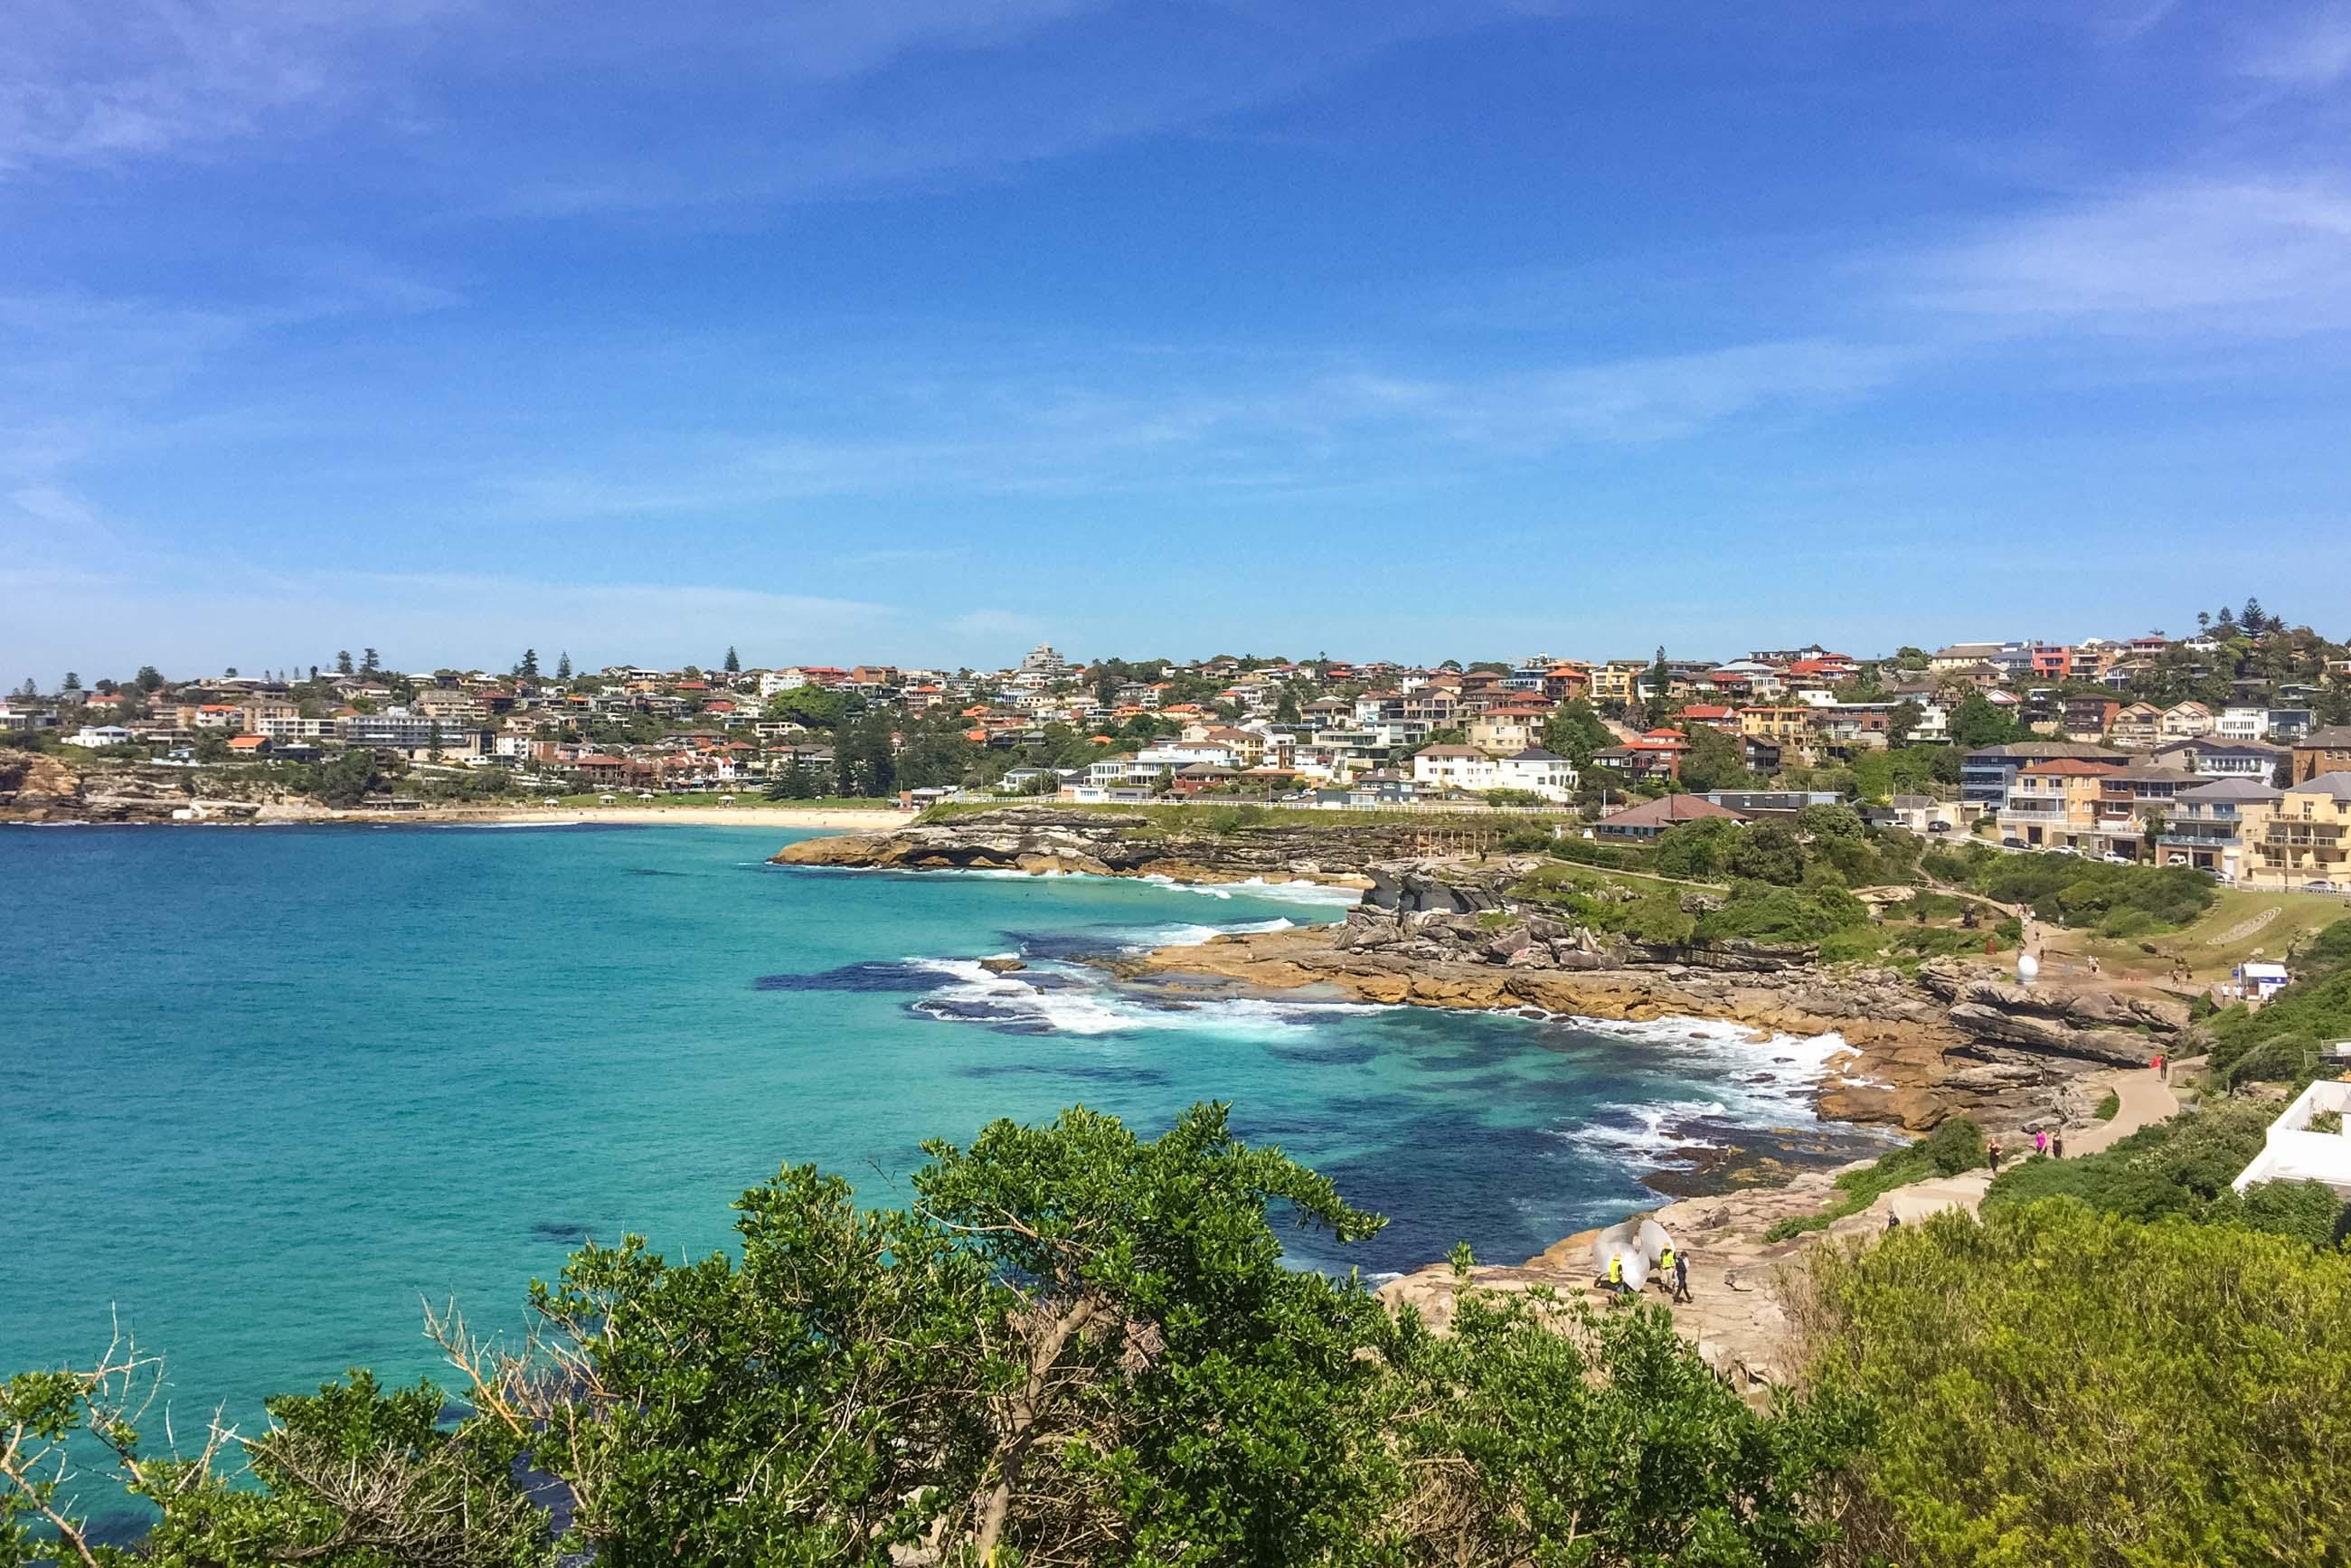 https://bubo.sk/uploads/galleries/5027/veron_hulikova_australia_sydney_bondi_beach_pohlad_nabronte2.jpg